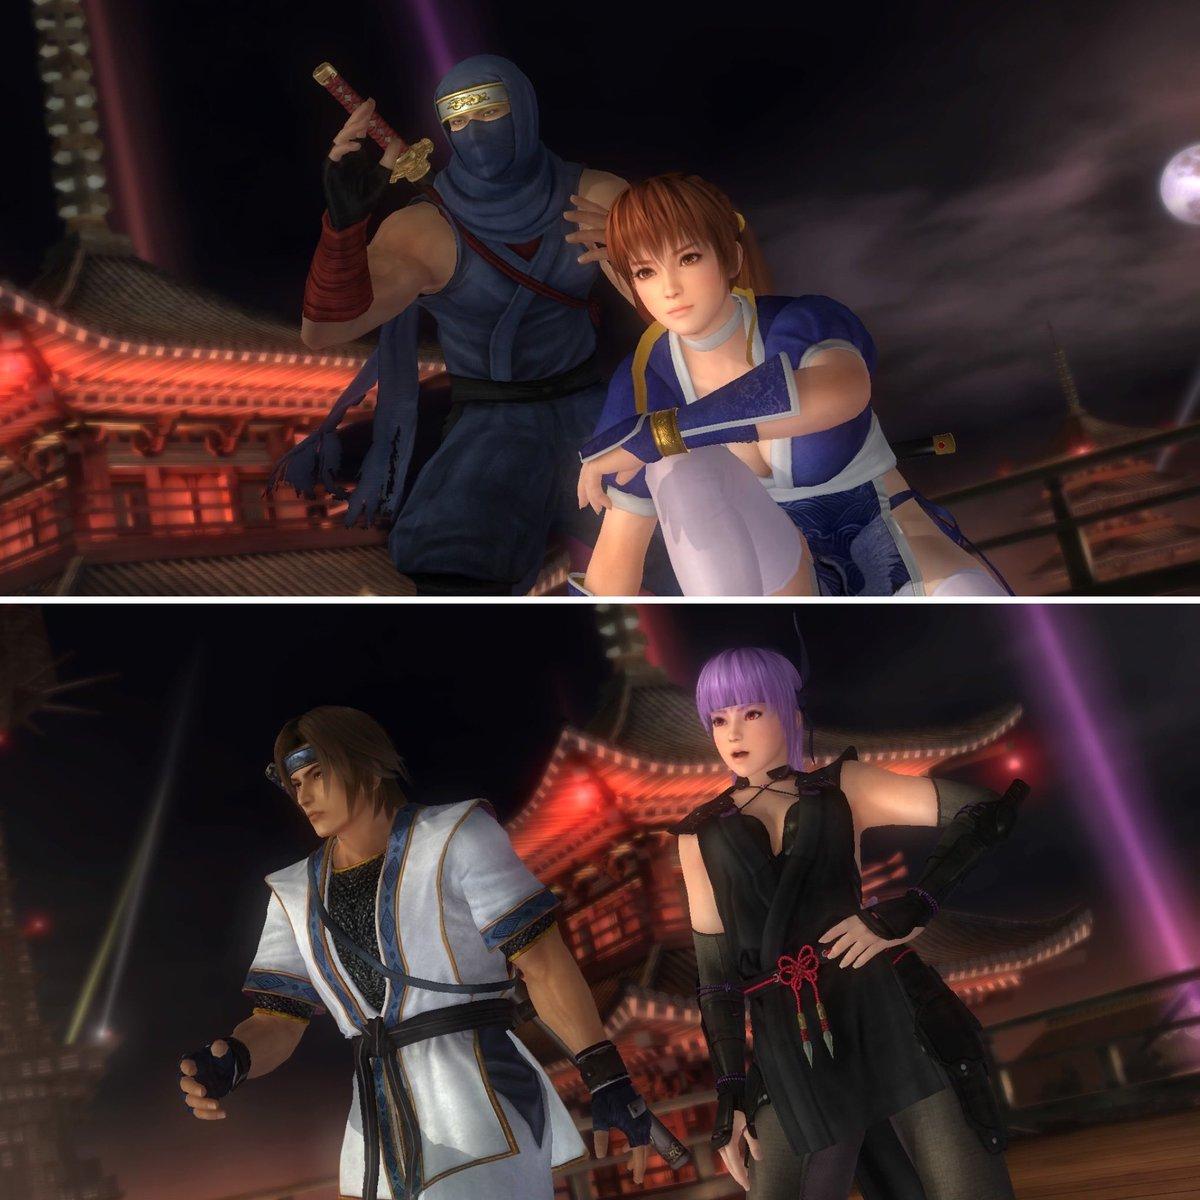 Lorenzo Buti On Twitter Would Be Nice If Ryu Hayabusa With The